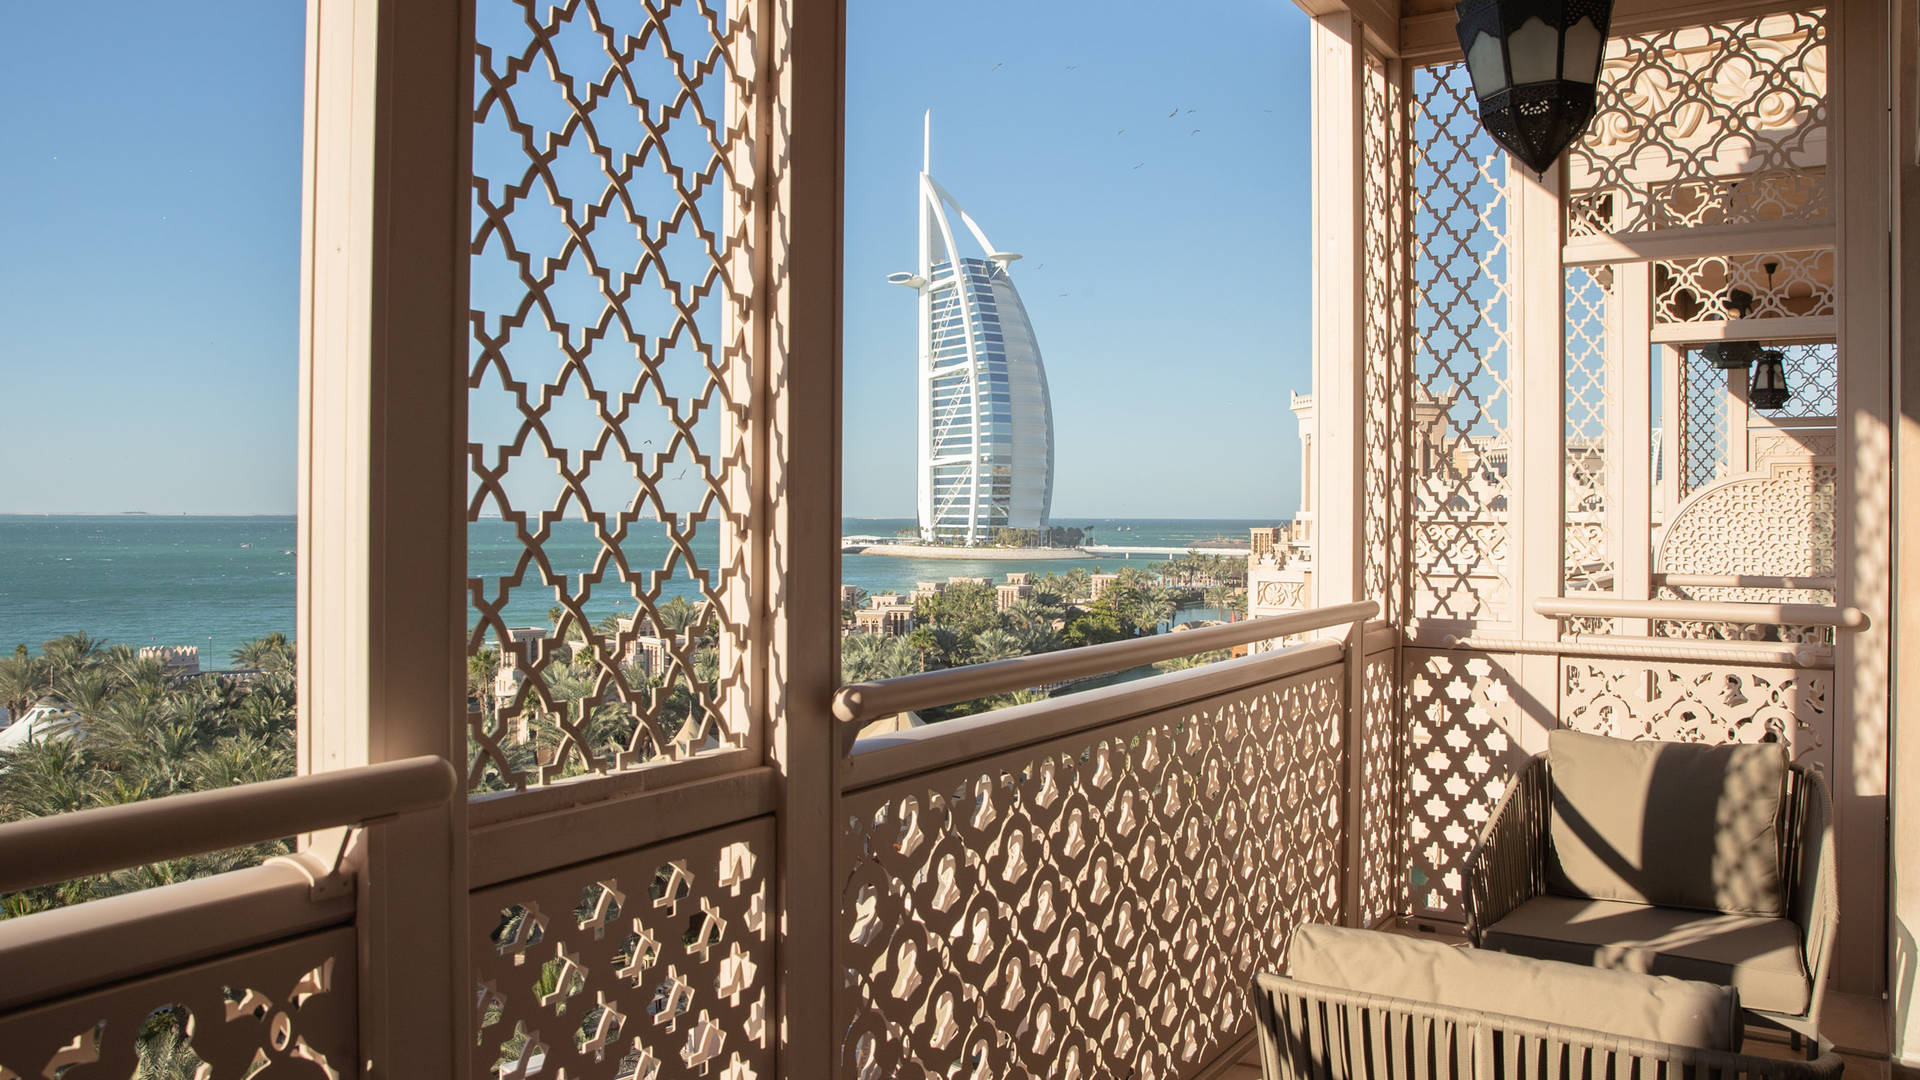 Jumeirah Al Qasr Presidential Suite Balcony